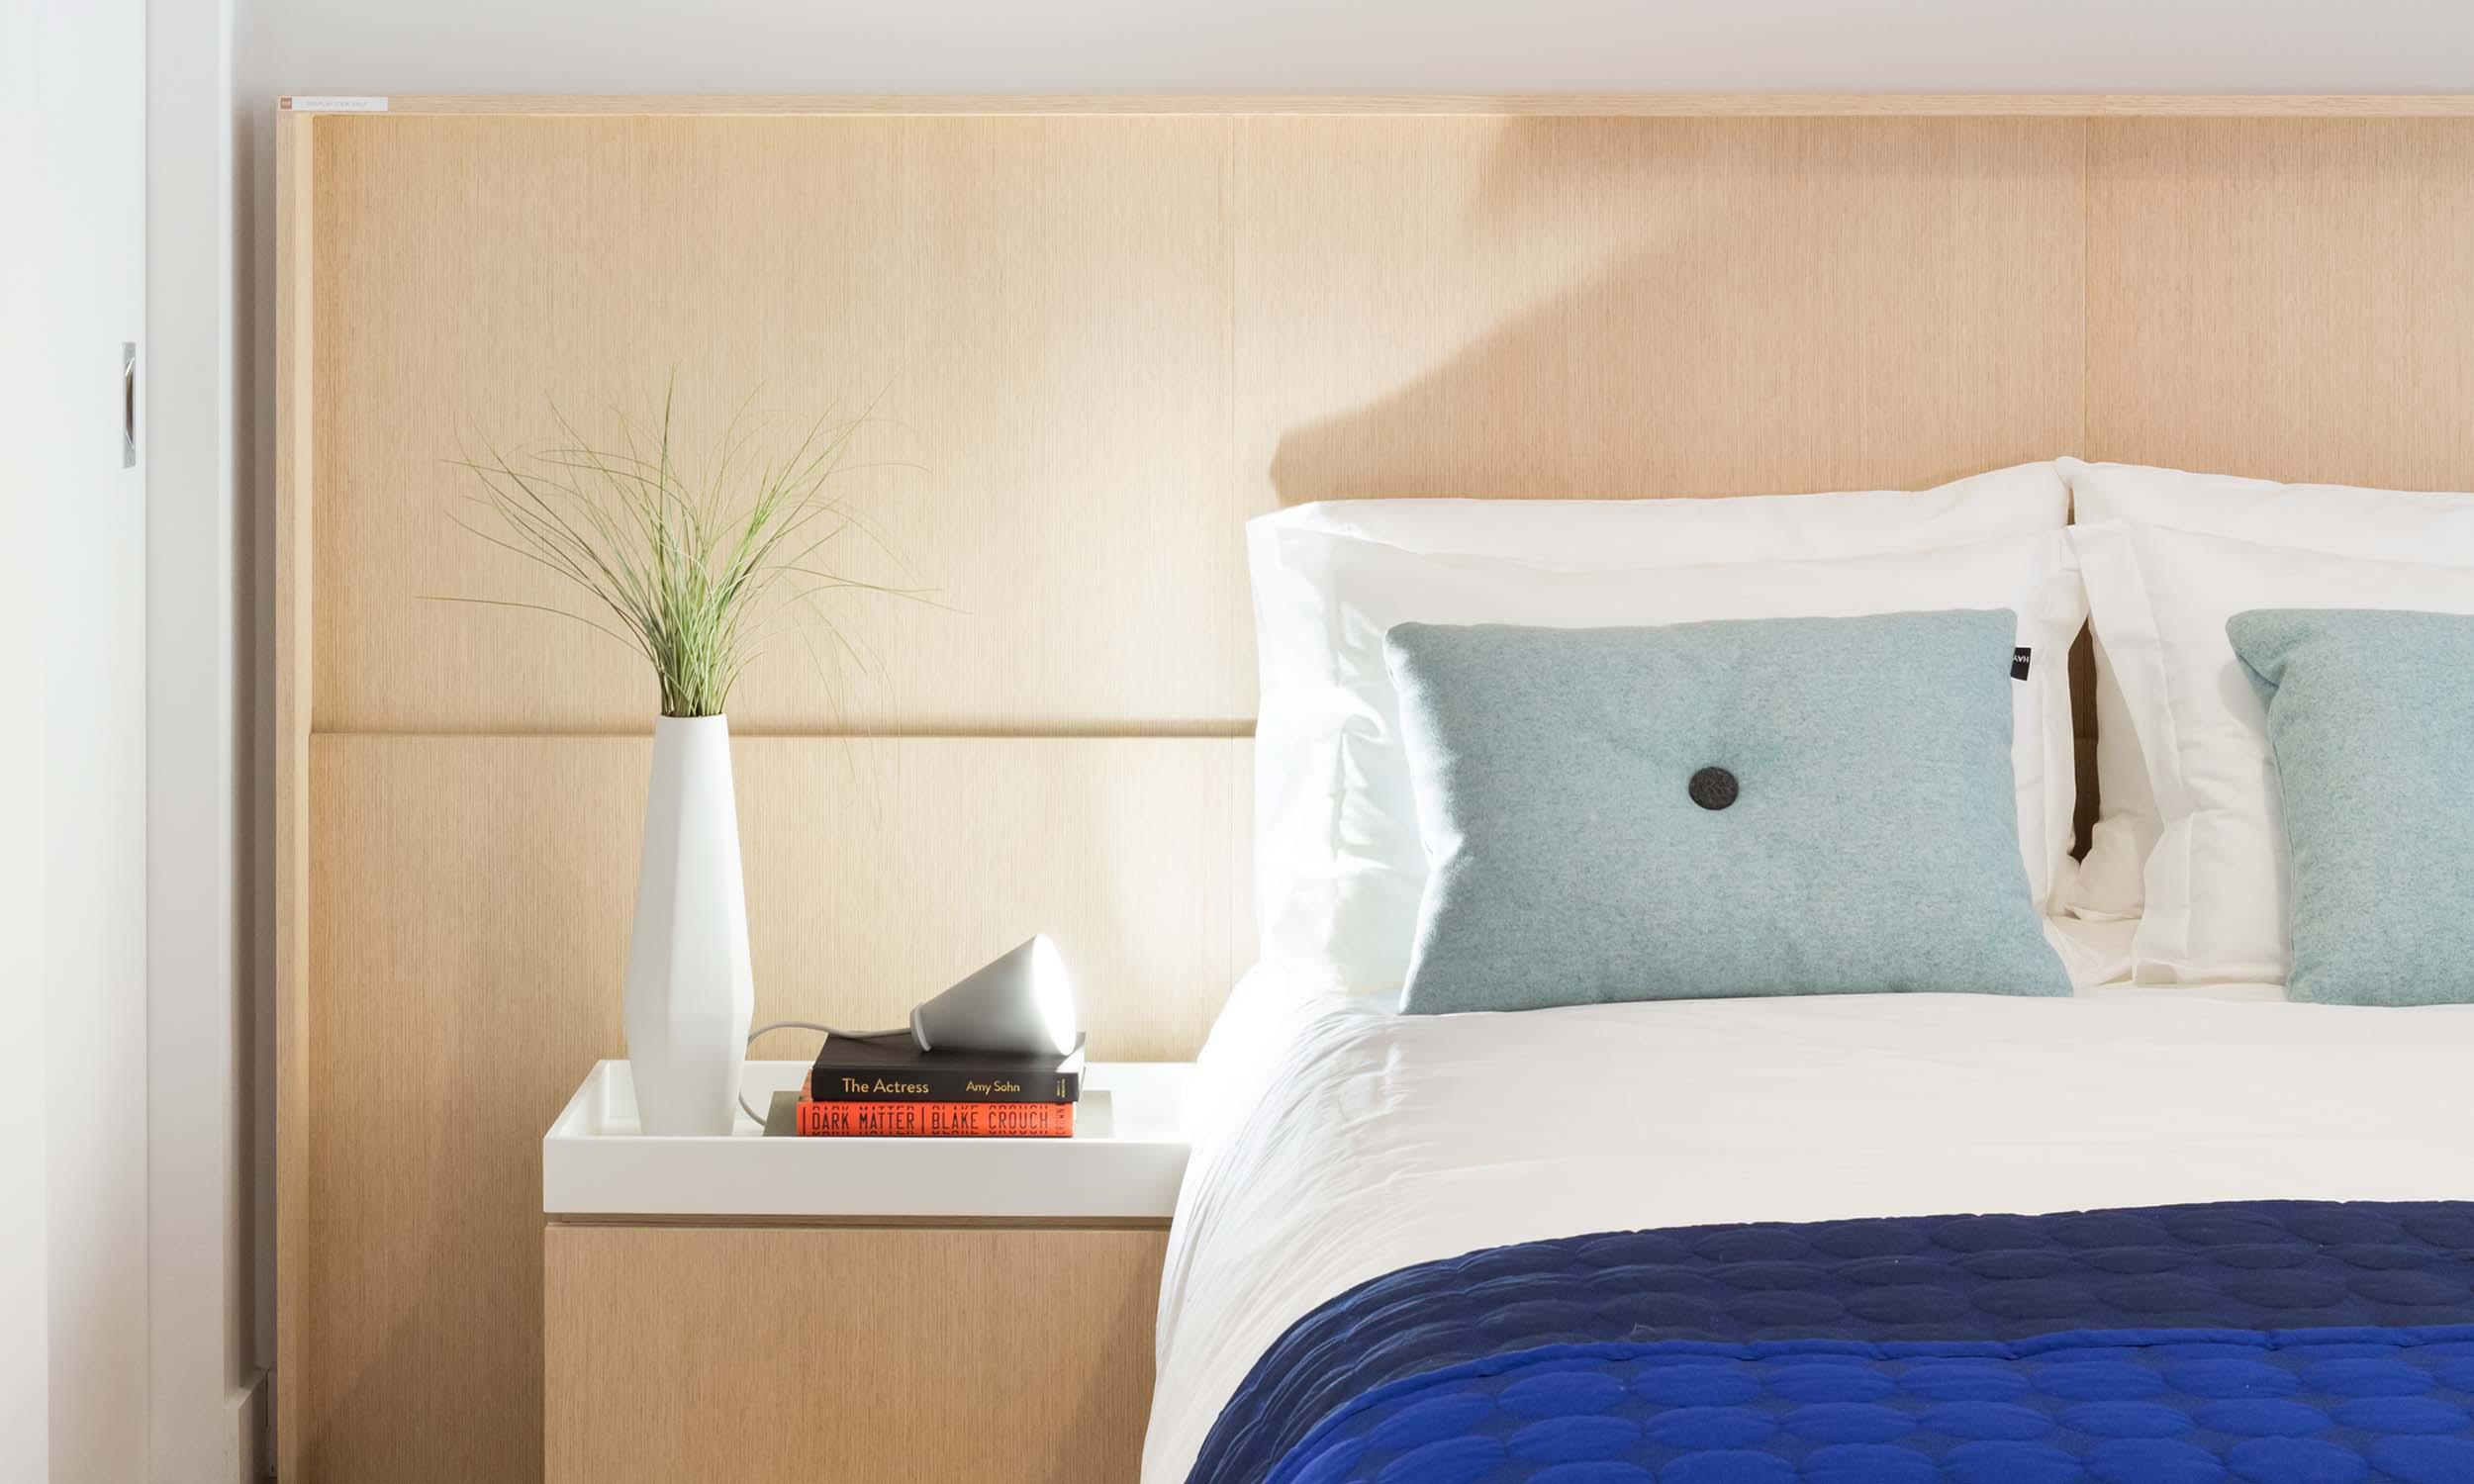 interior_0003_bed-2